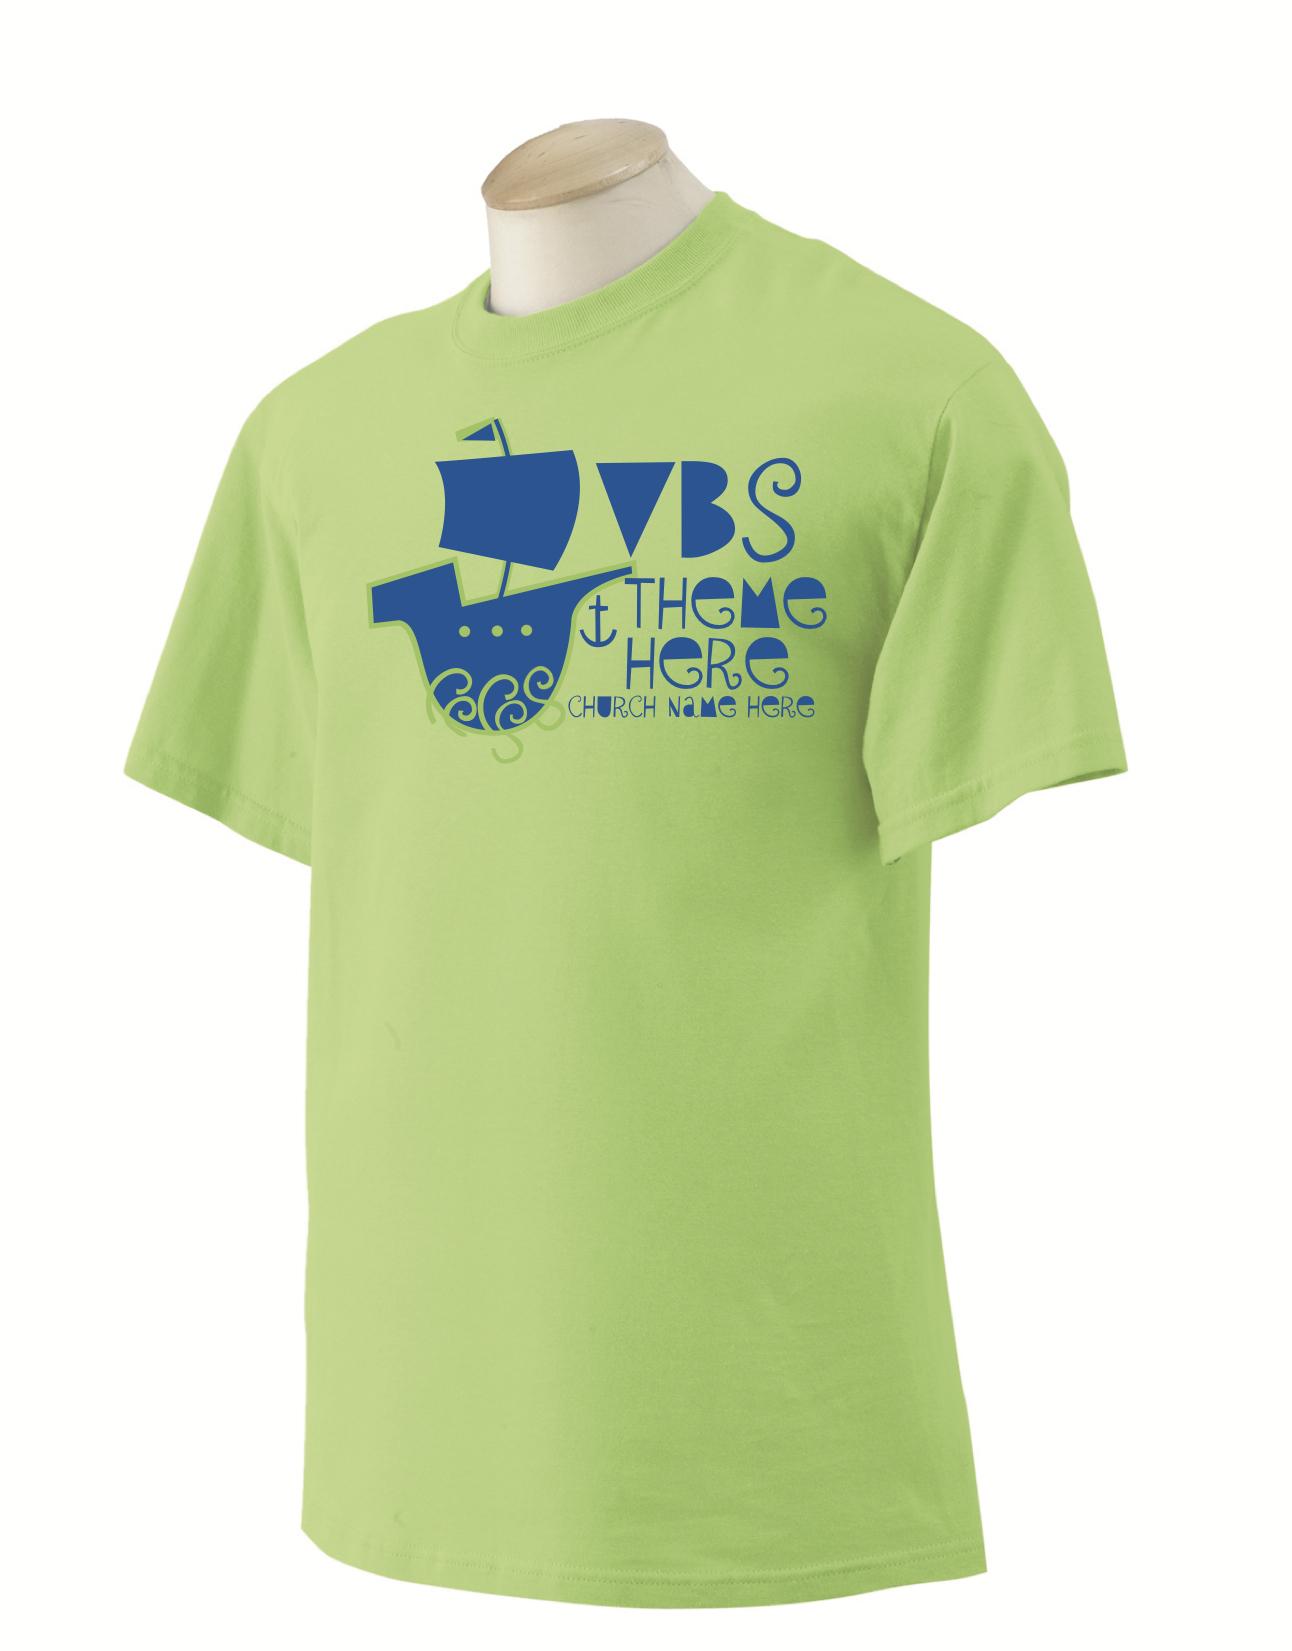 ocean 3 lime green shirt.jpg